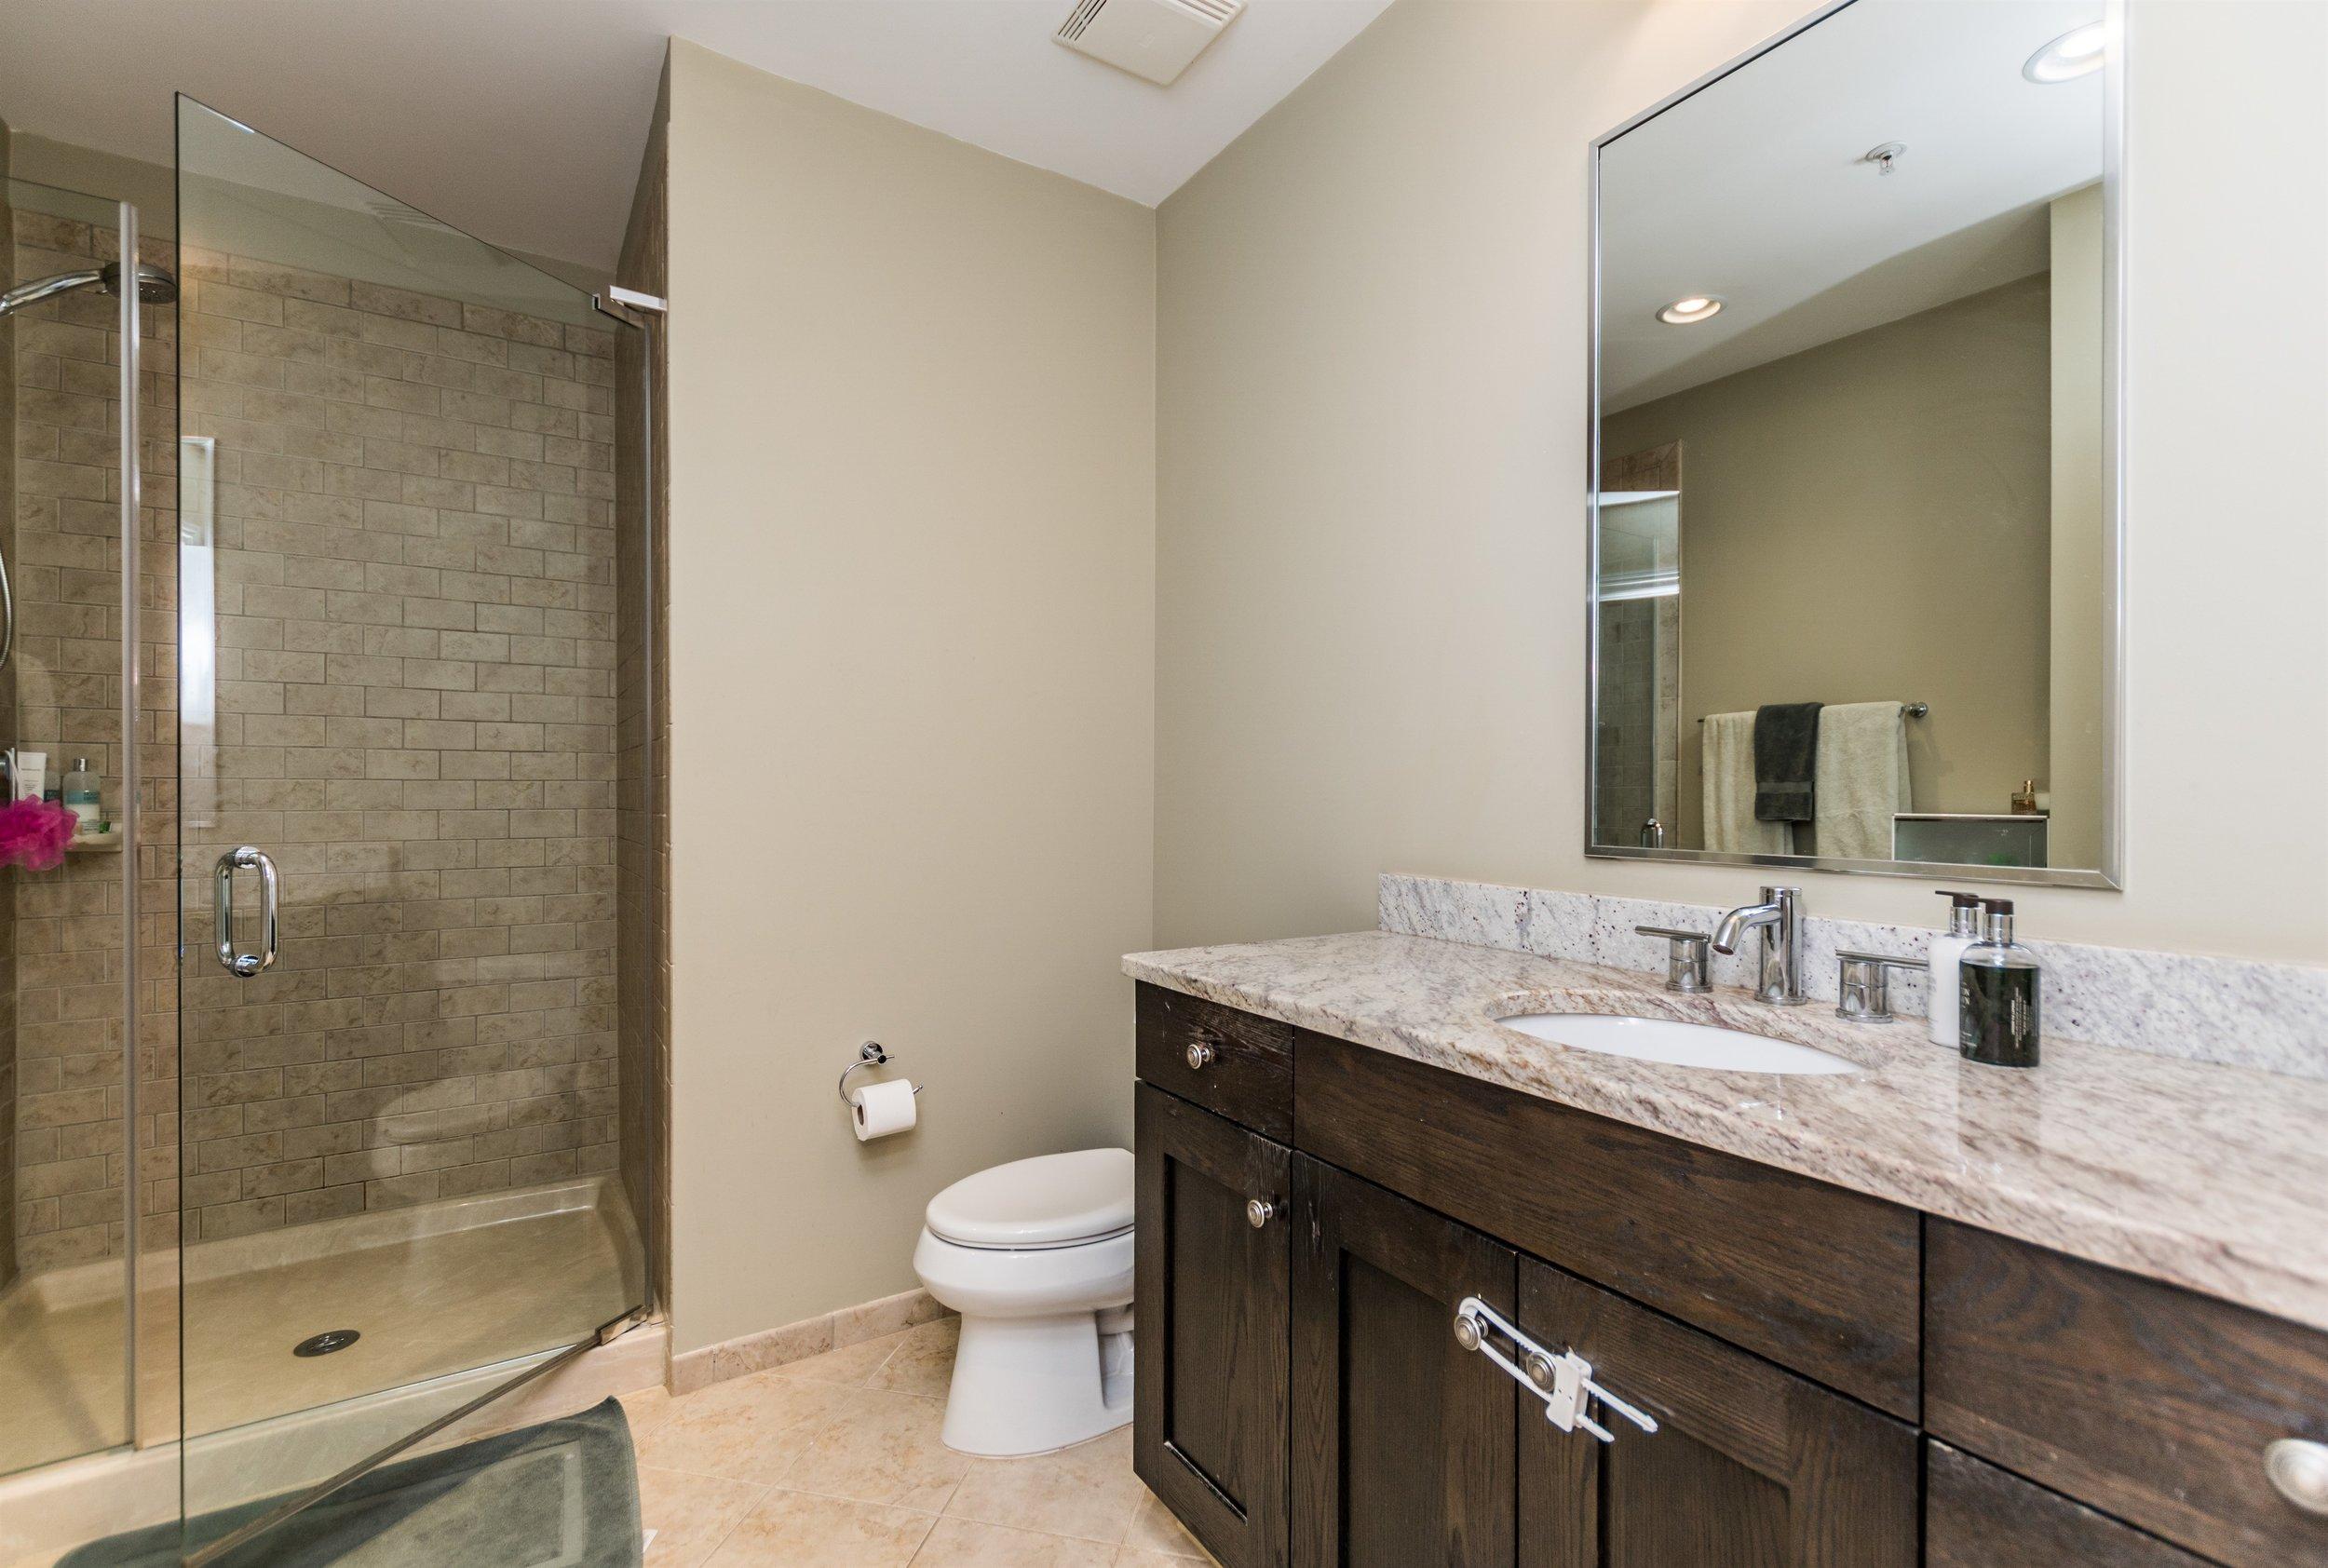 021_Hallway Full Bathroom.jpg